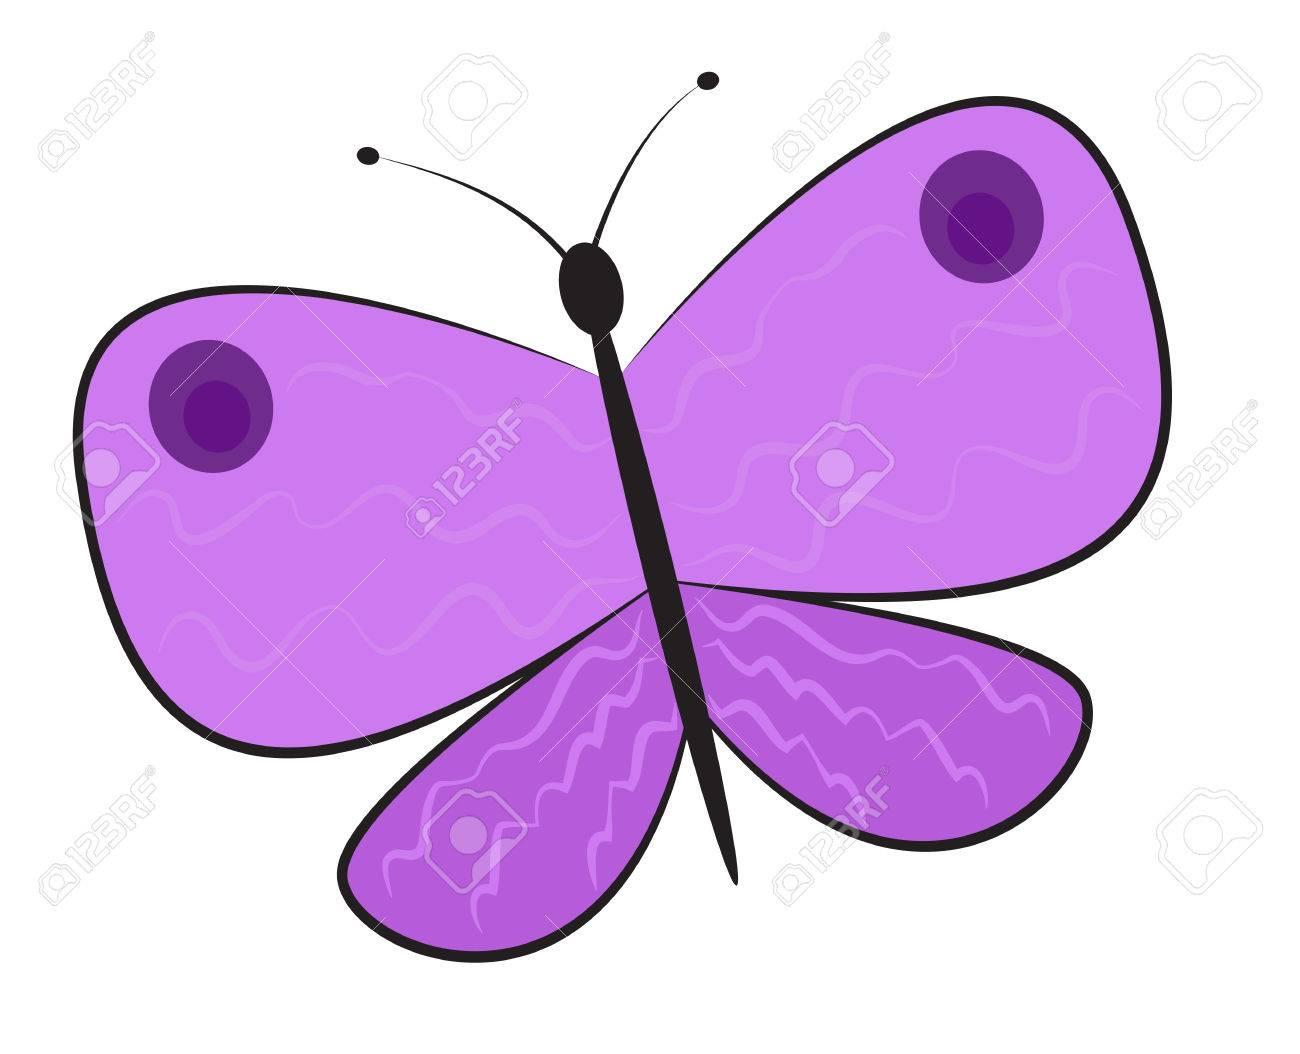 Simple caricatura mariposa púrpura. Clipart. ilustración vectorial.